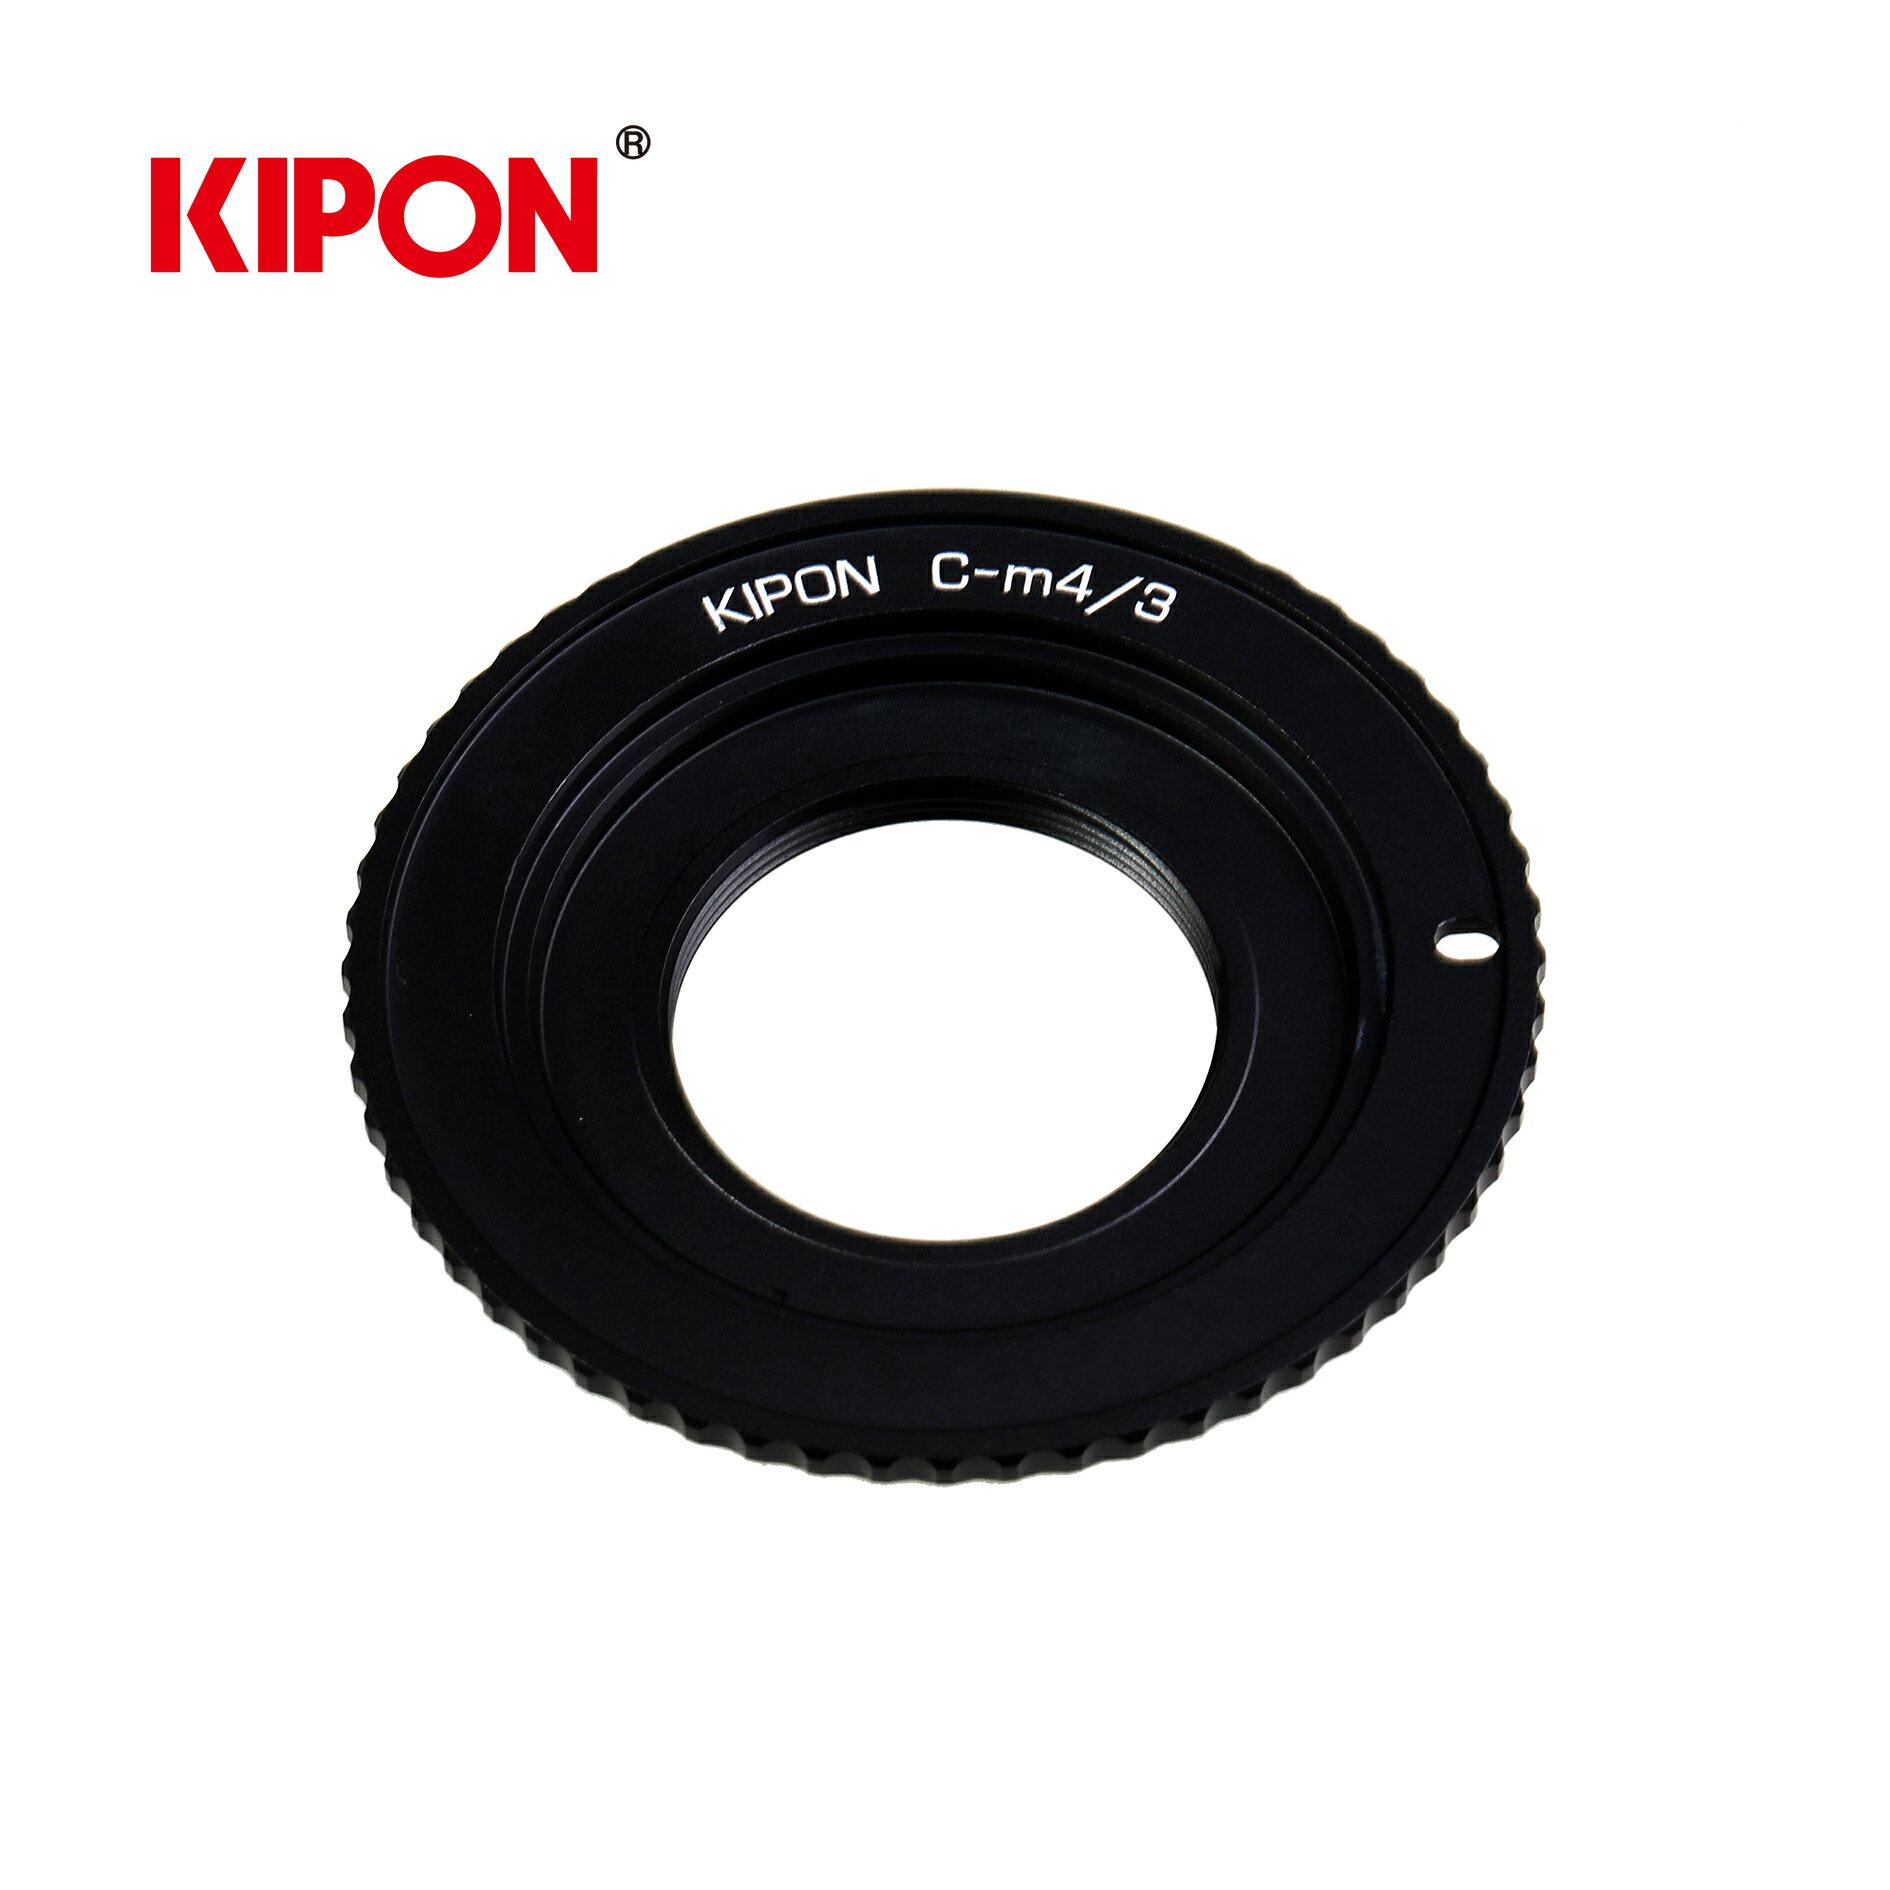 kipon C mount -m4/3 (for Panasonic GX7/GX1/G10/GF6/GF5/GF3/GF2/GM1)